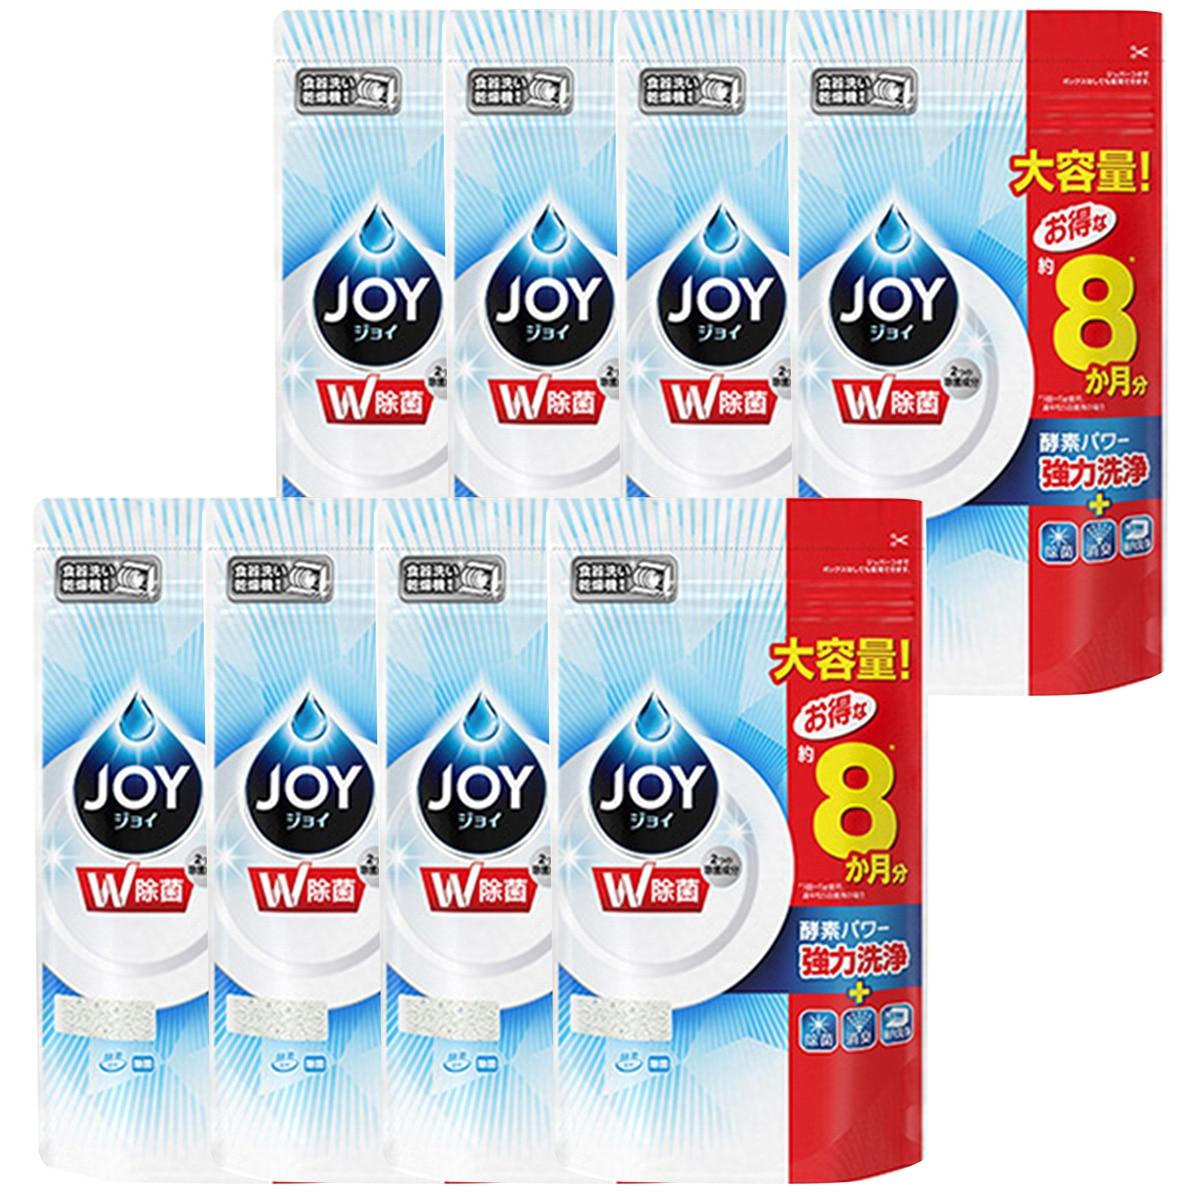 P&G ジョイ 食洗機用洗剤 除菌 つめかえ 特大 930g×8袋